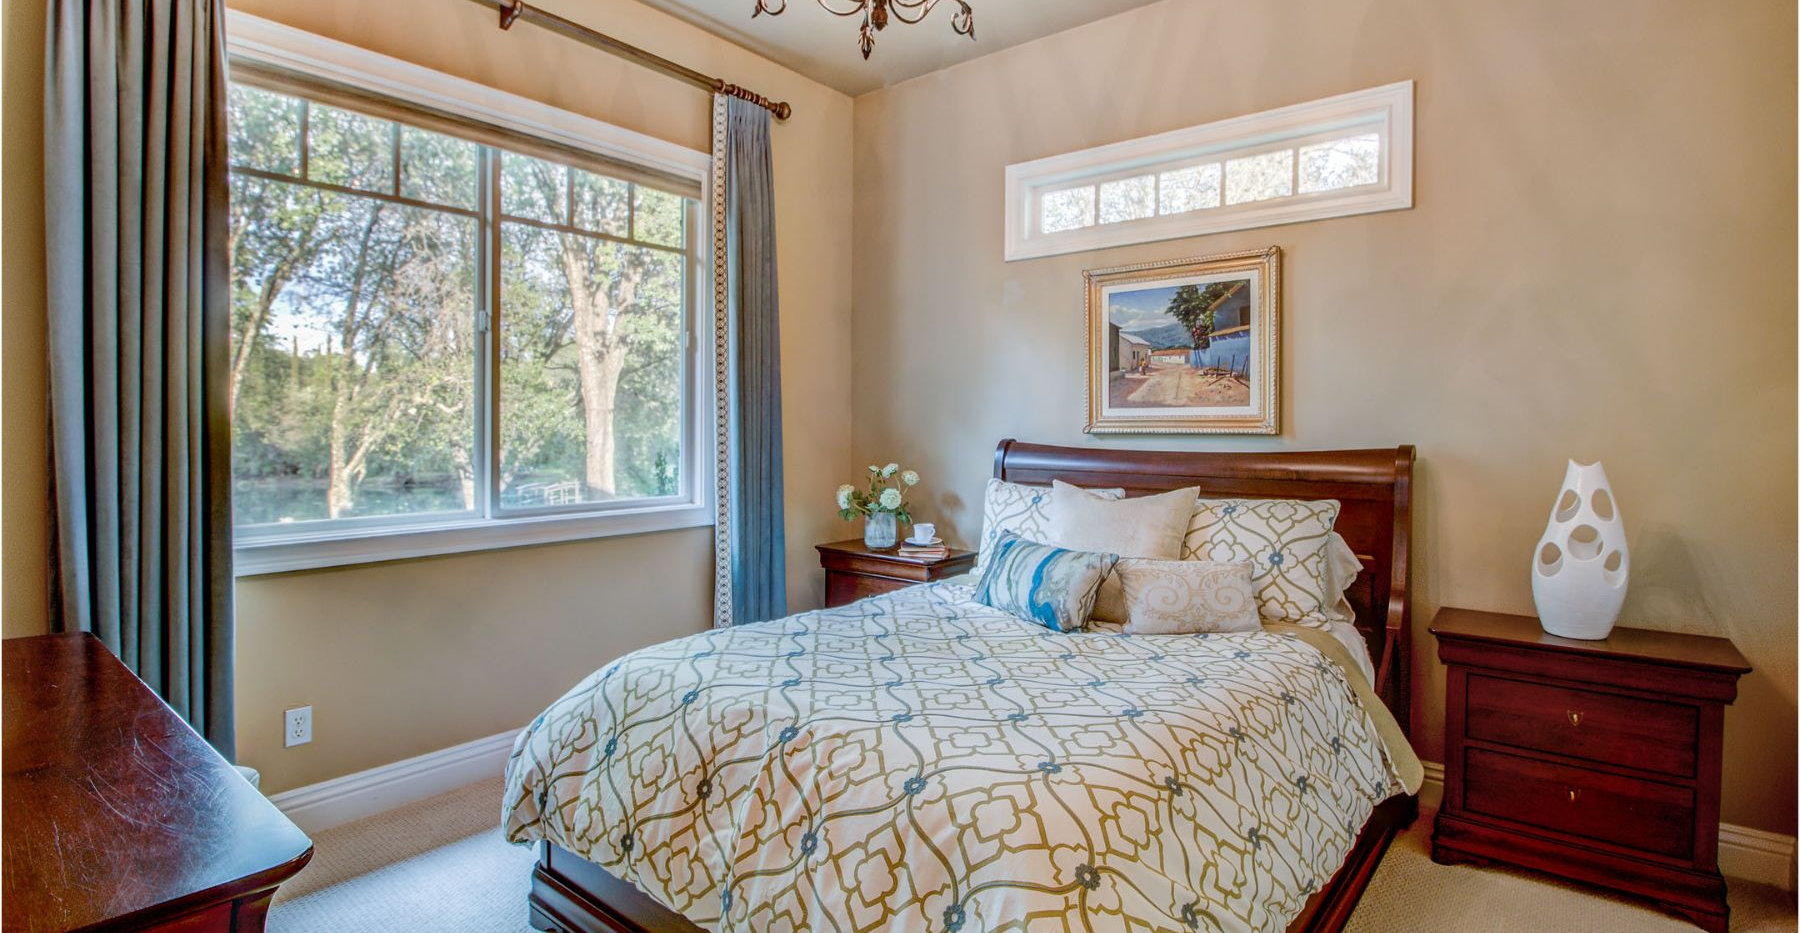 35 Bedroom.jpg